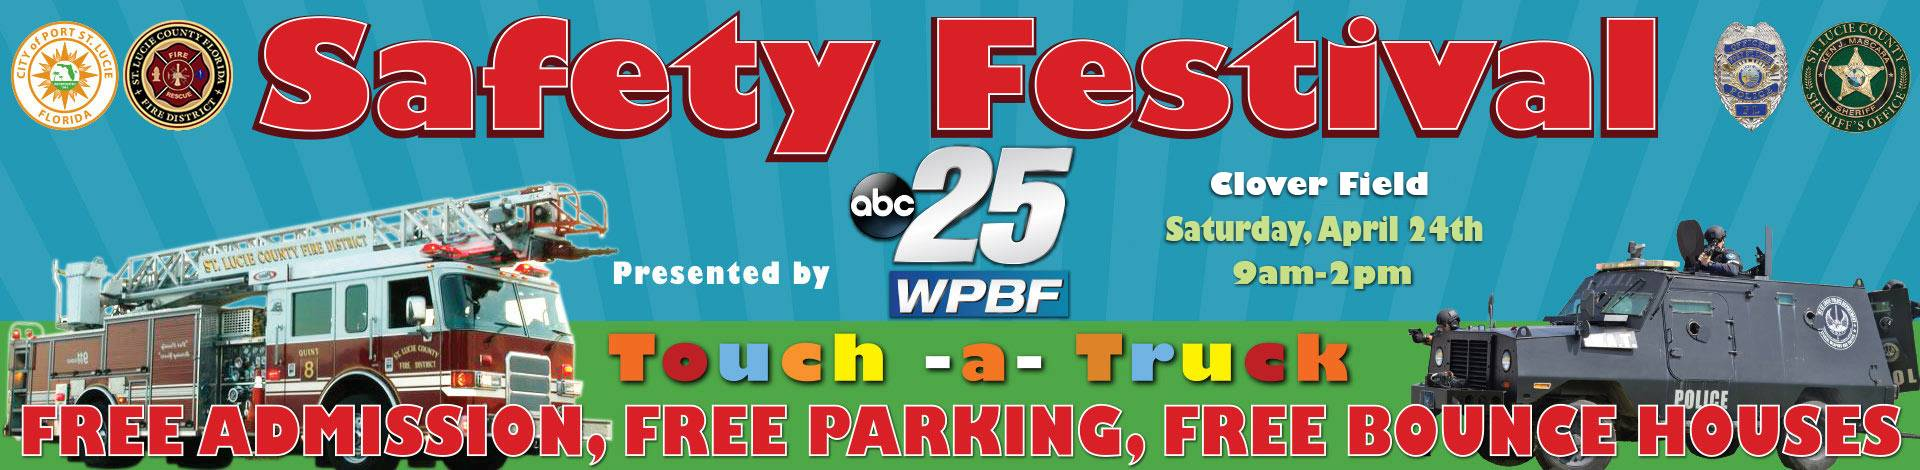 Safety Festival